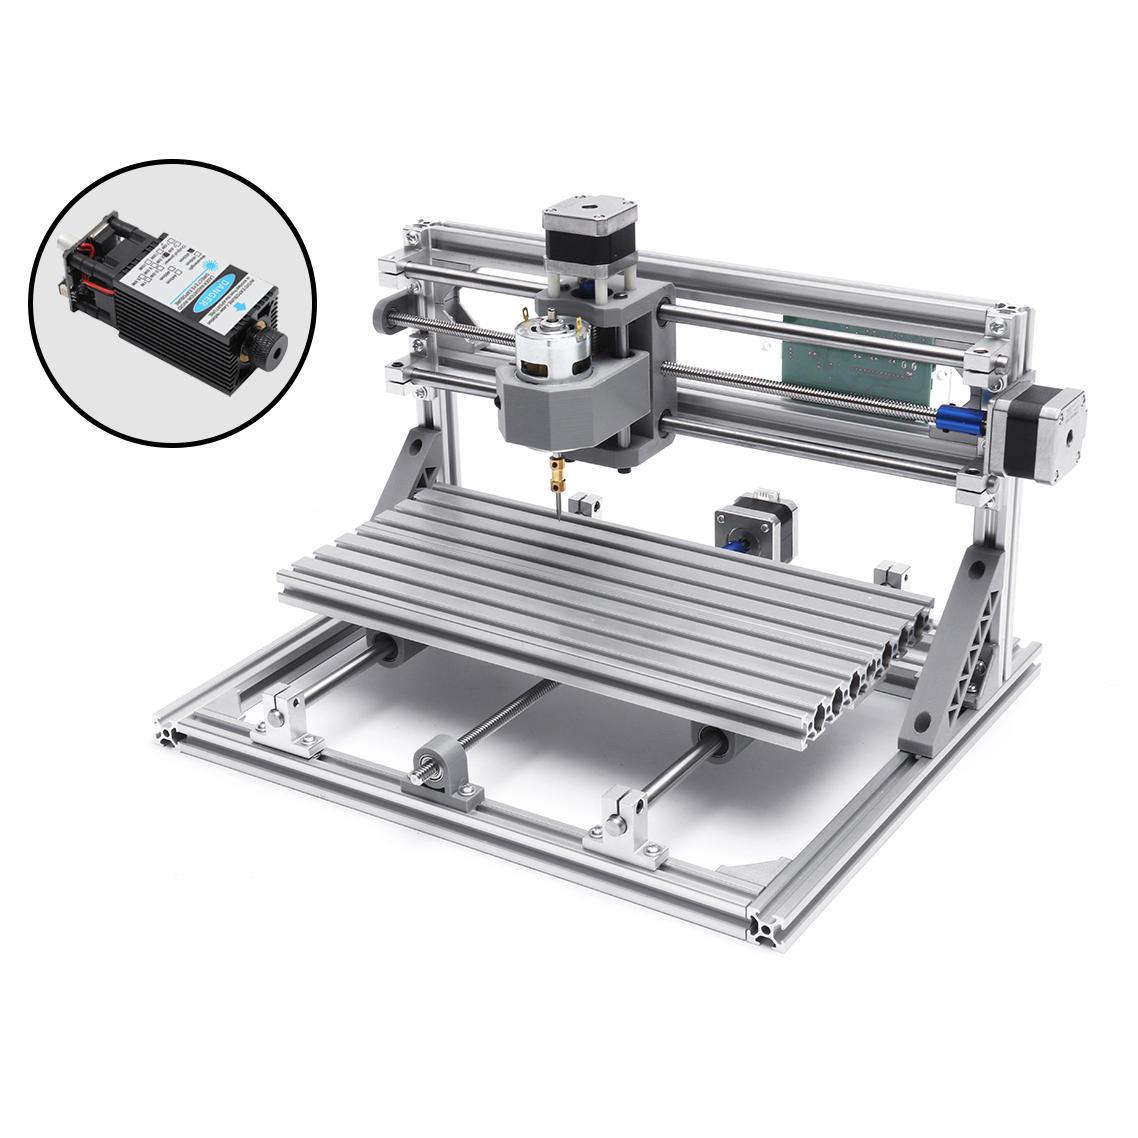 3018 3 Axis Mini DIY CNC Router w/ 2500mW Laser Module Wood Engraving Cutting Milling Engraver Machine